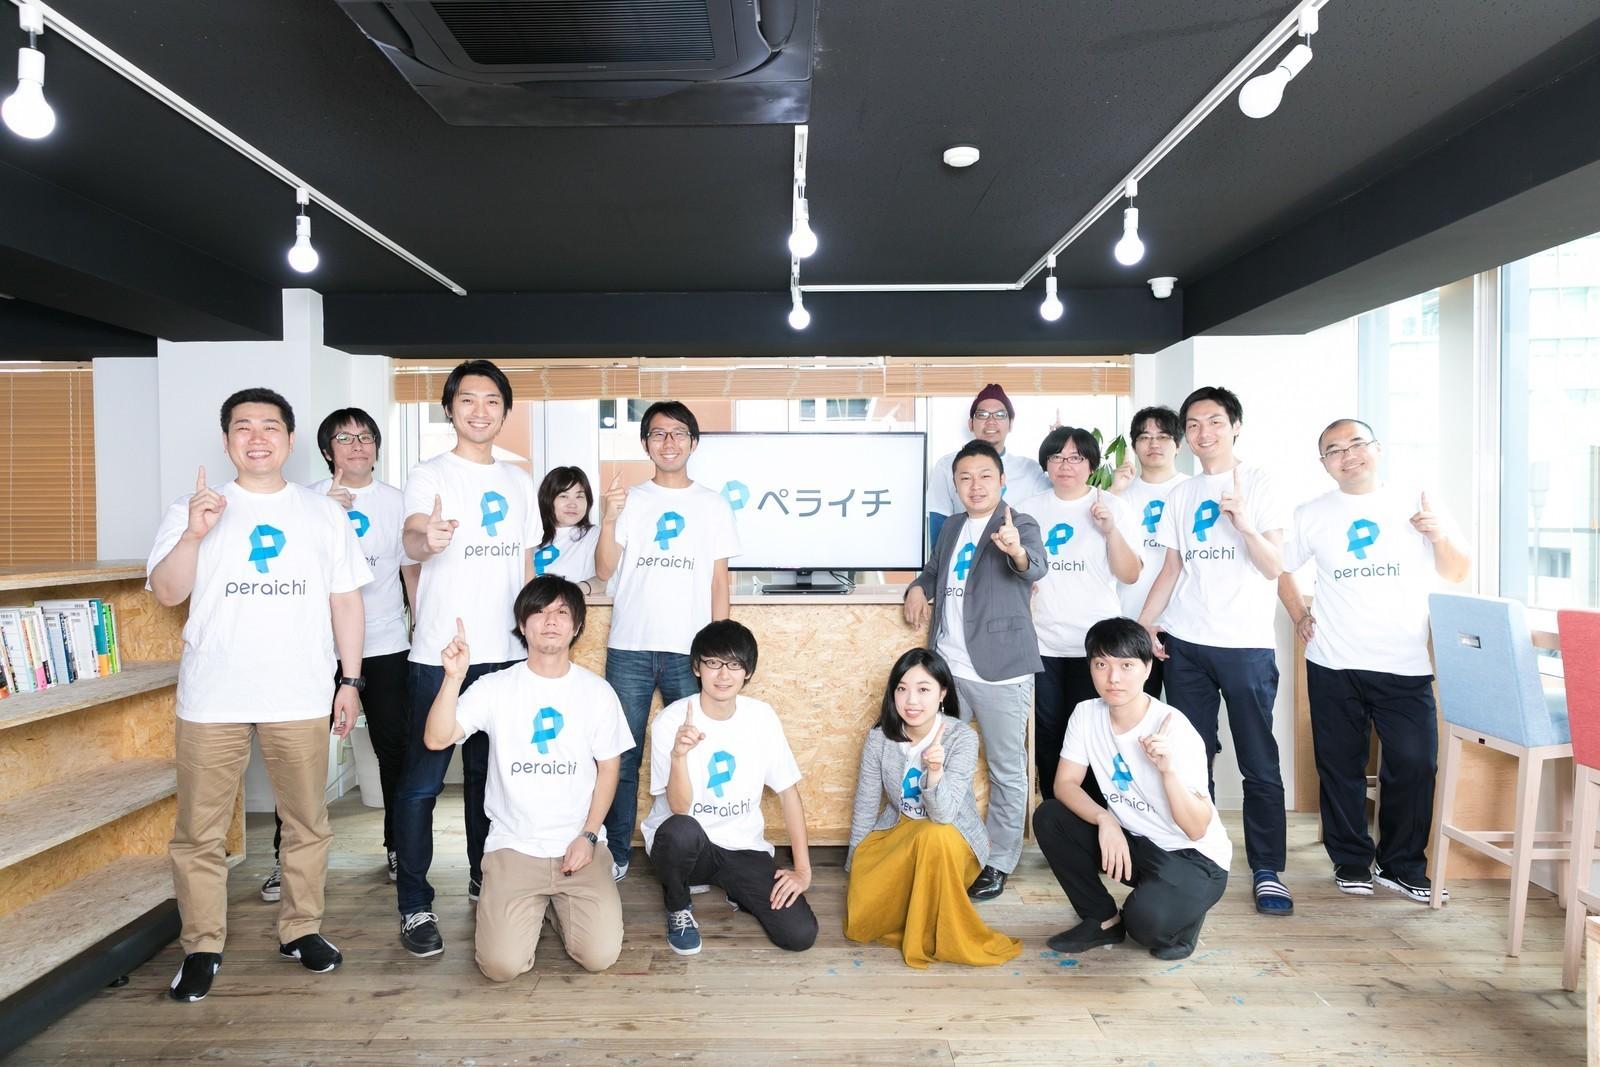 CakePHP経験者大歓迎!サービスを盛り上げてくれるWebエンジニア募集